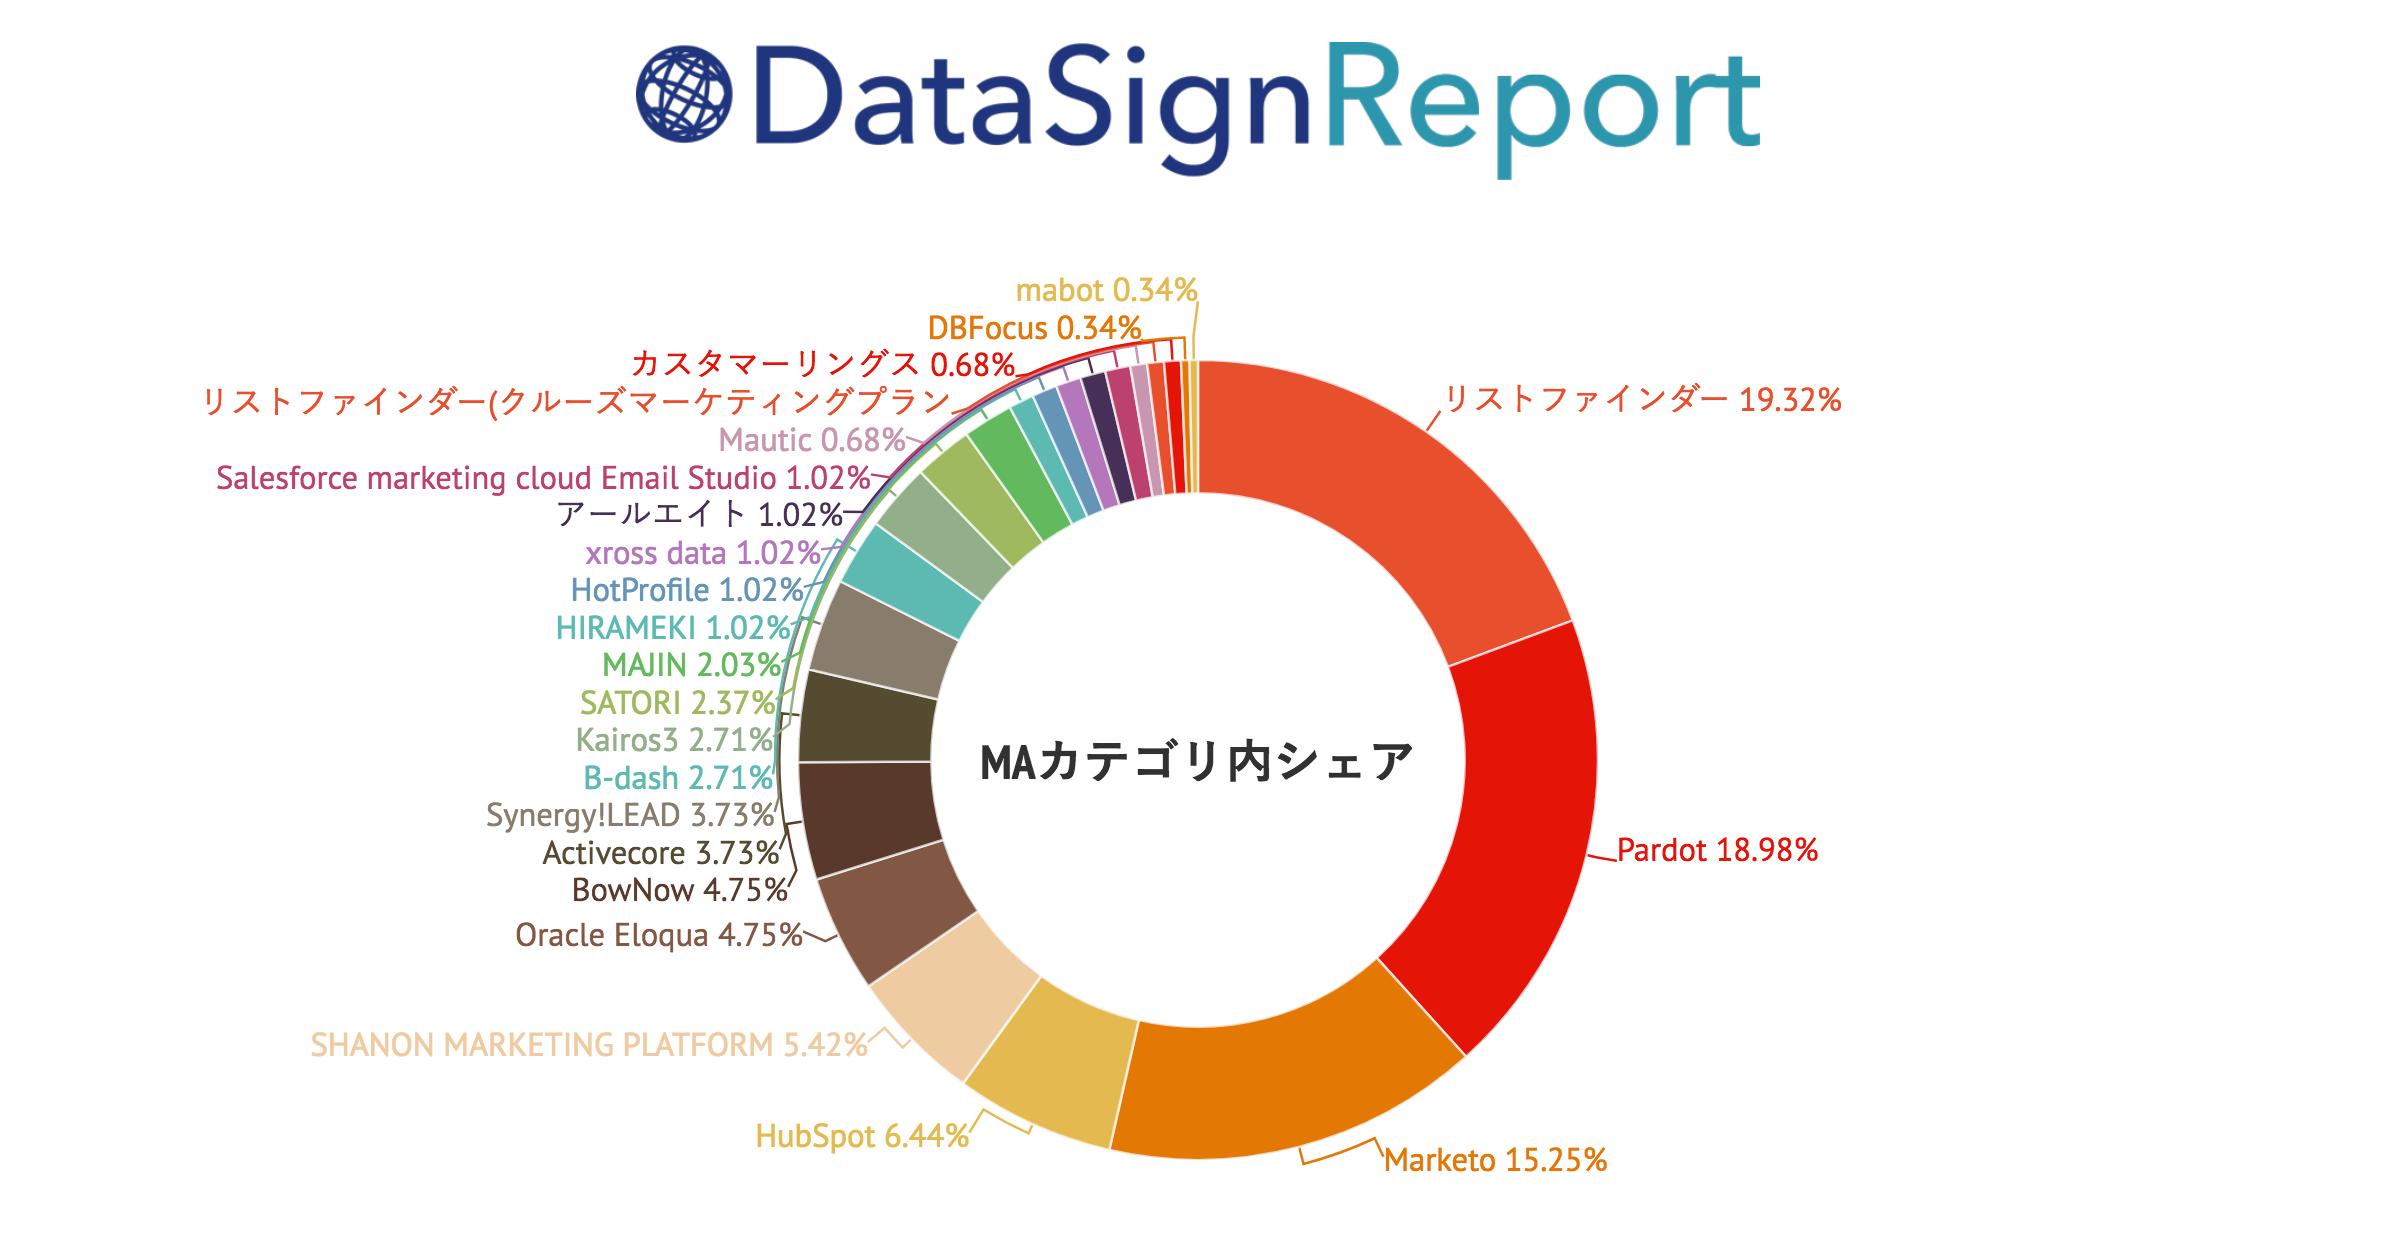 DataSign Report 上場企業調査 2017.12